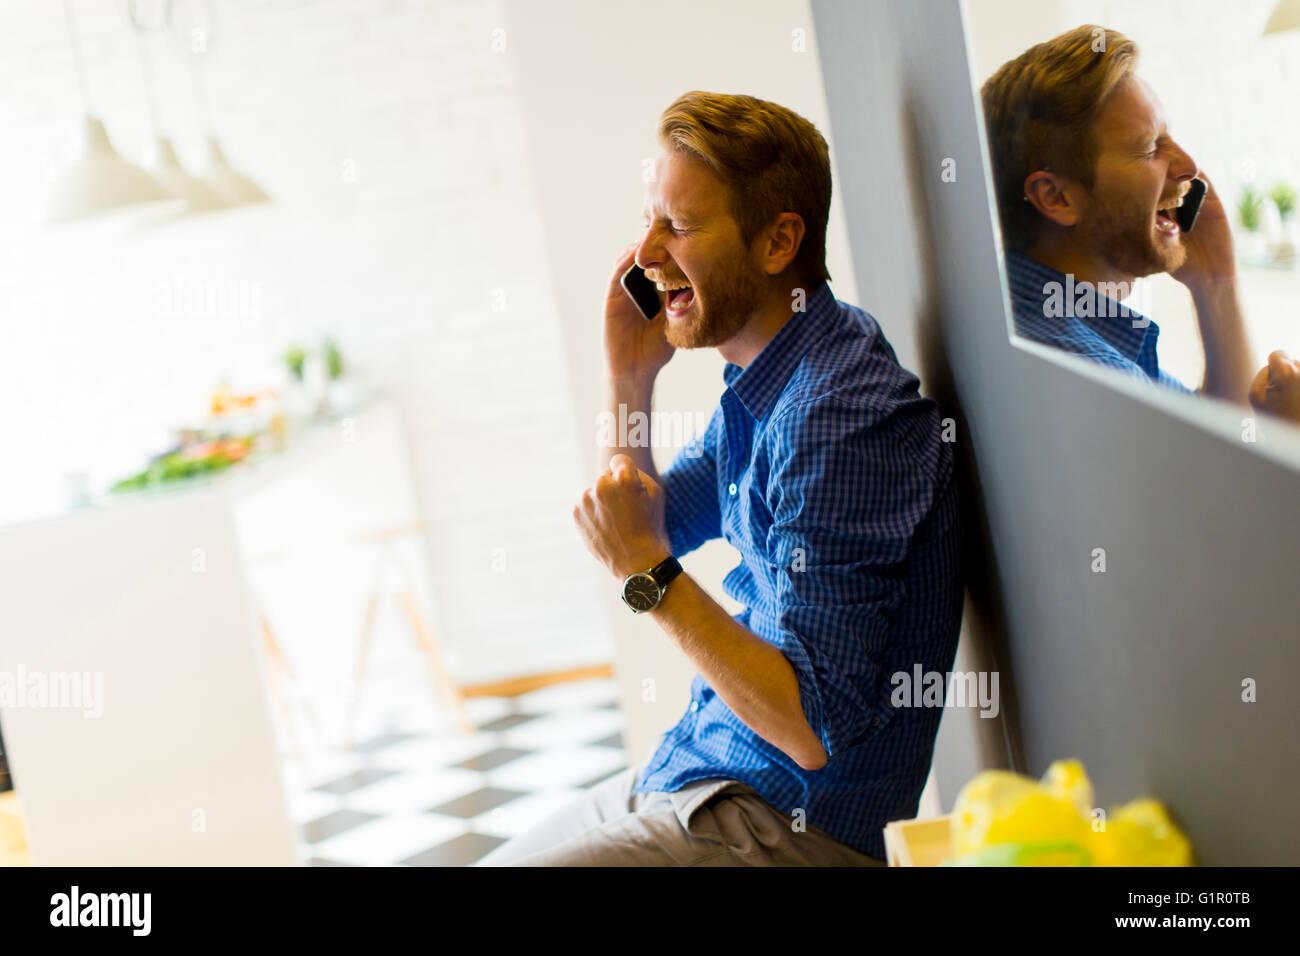 Man on the phone yelling with joy - Stock Image